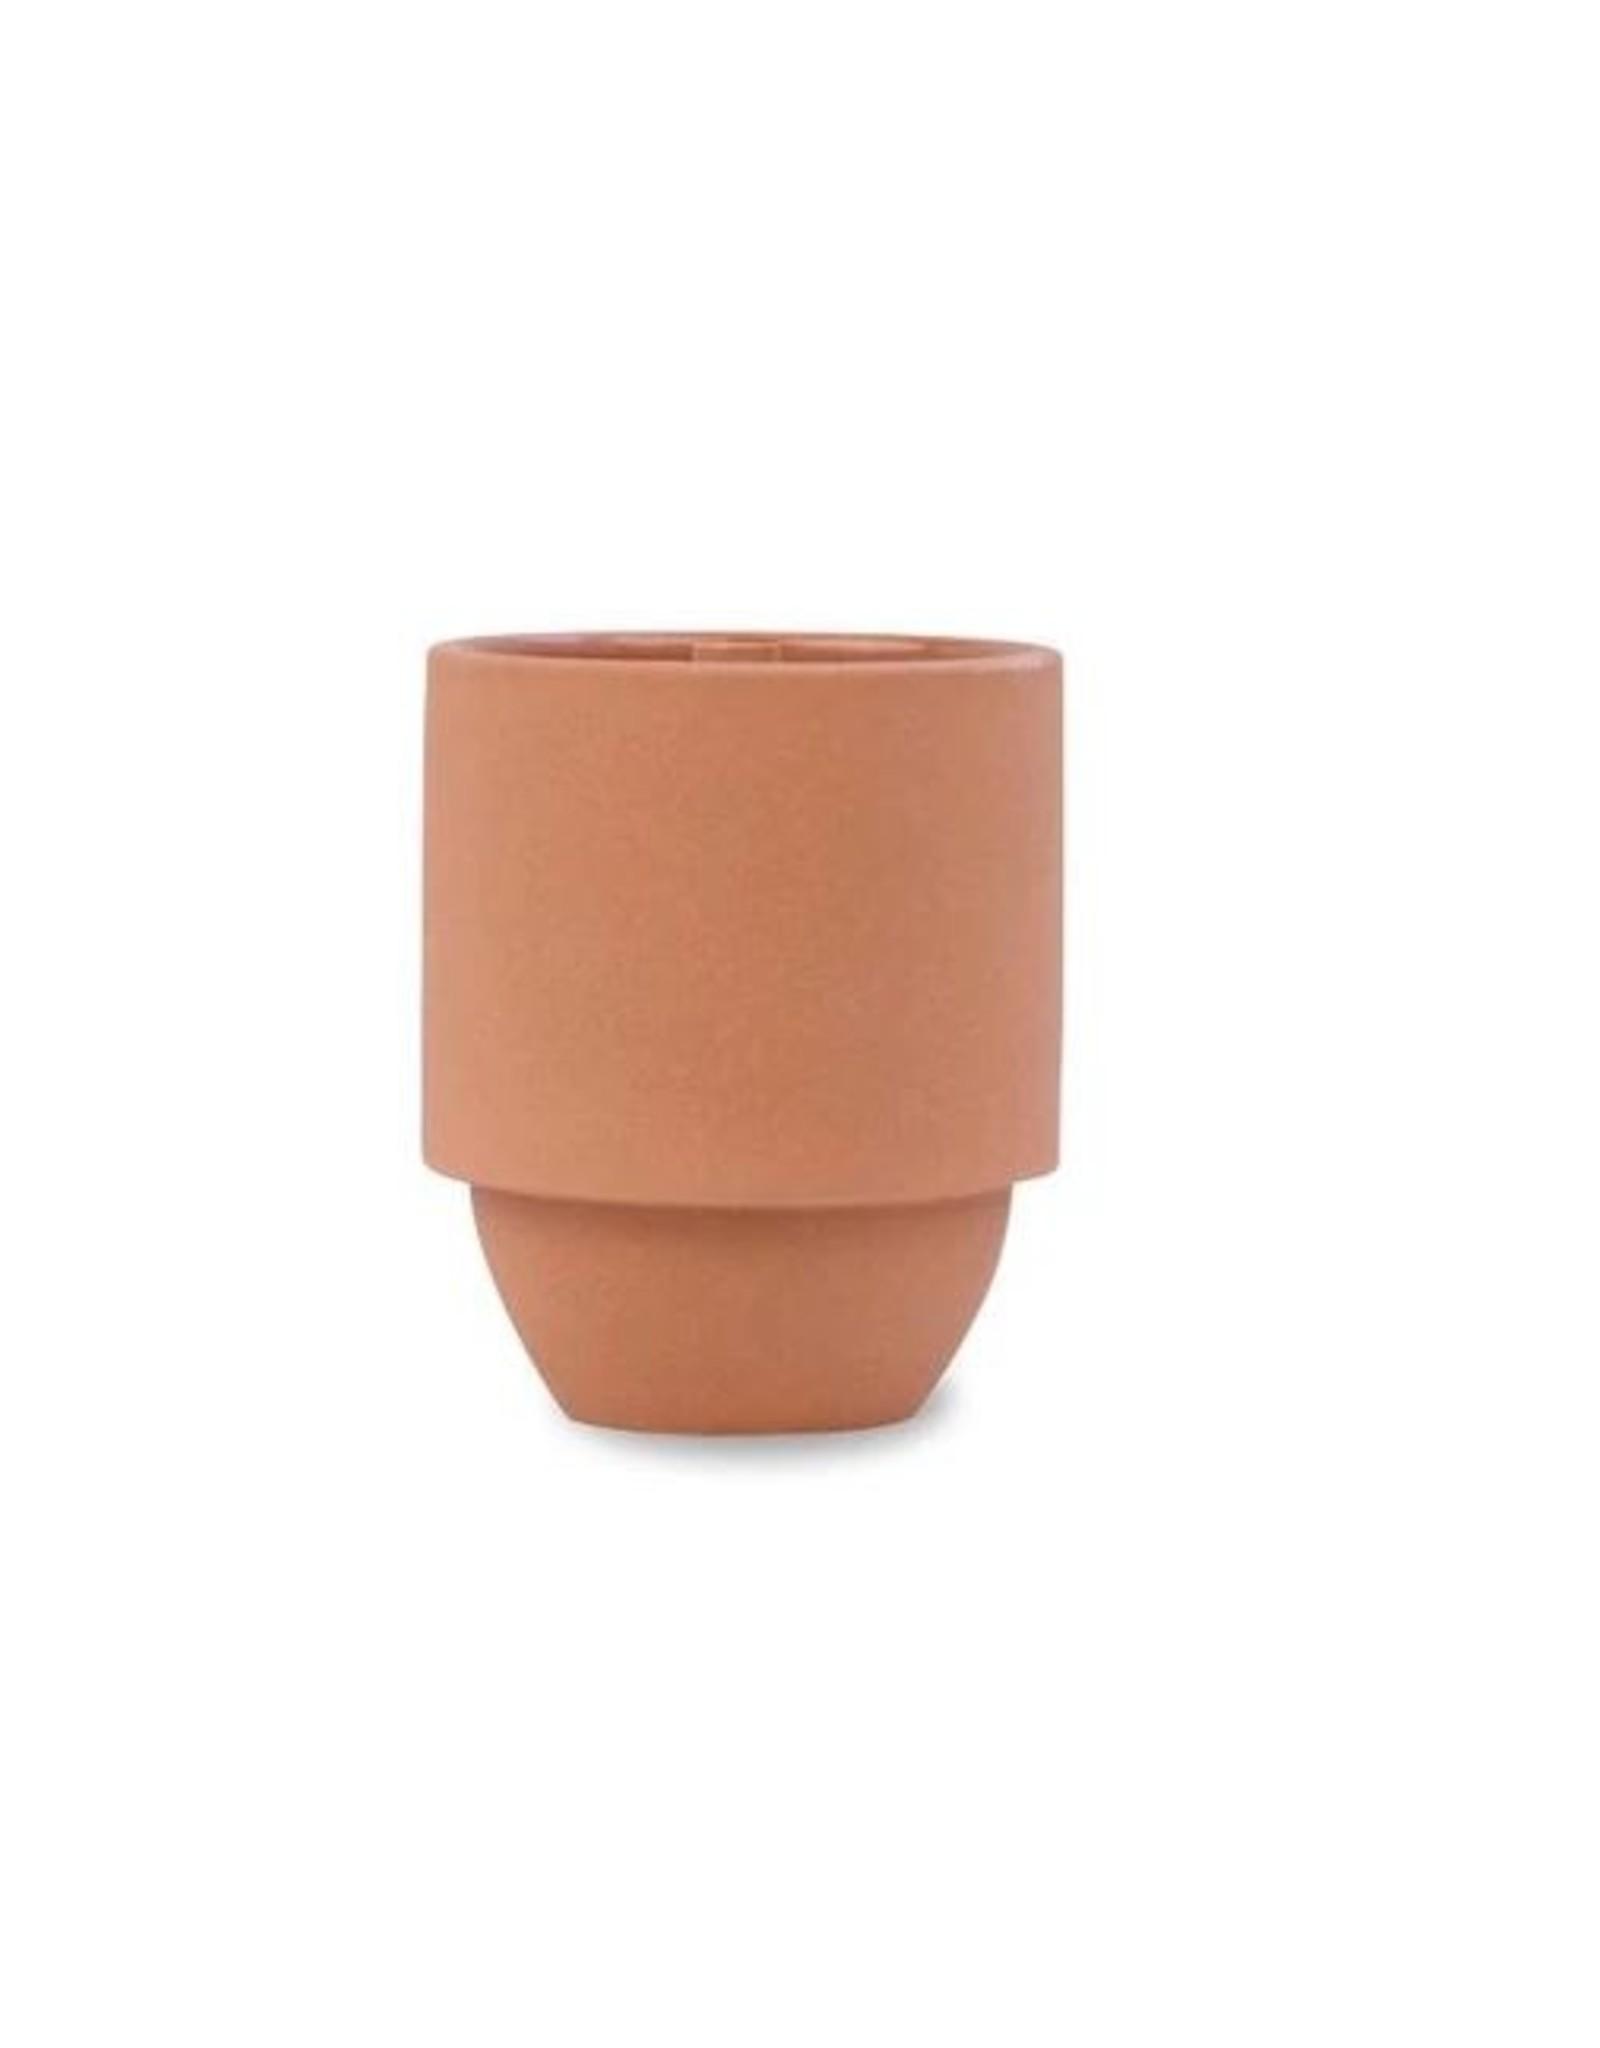 Cactus Flower + Fern  Candle 11oz